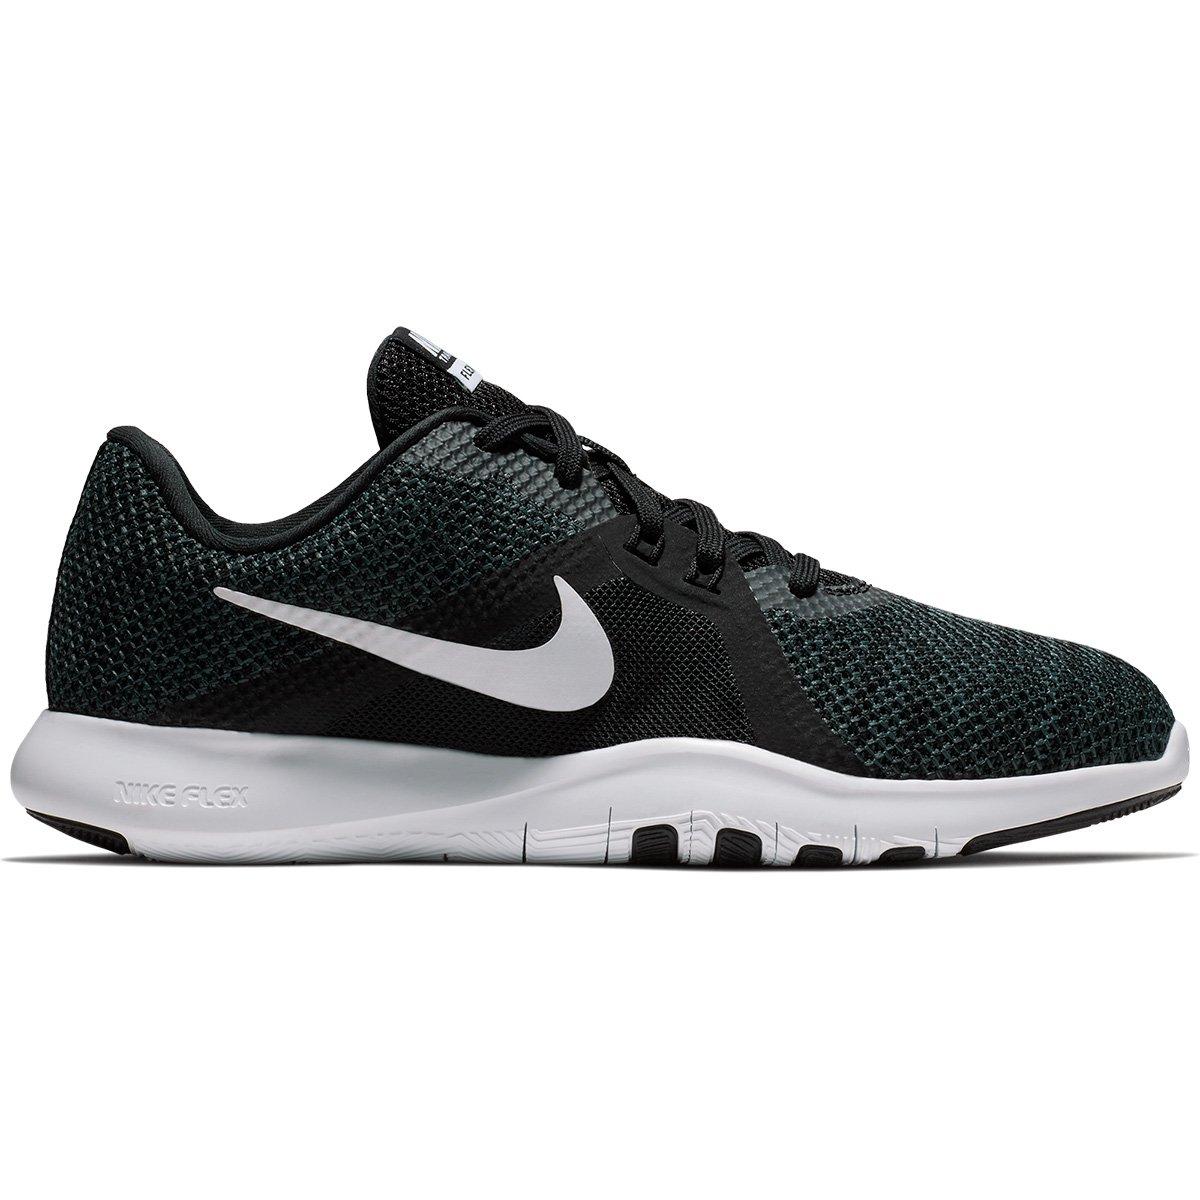 Tenis Nike Flex Trainer 8 Feminino Preto E Branco Loja Do Inter